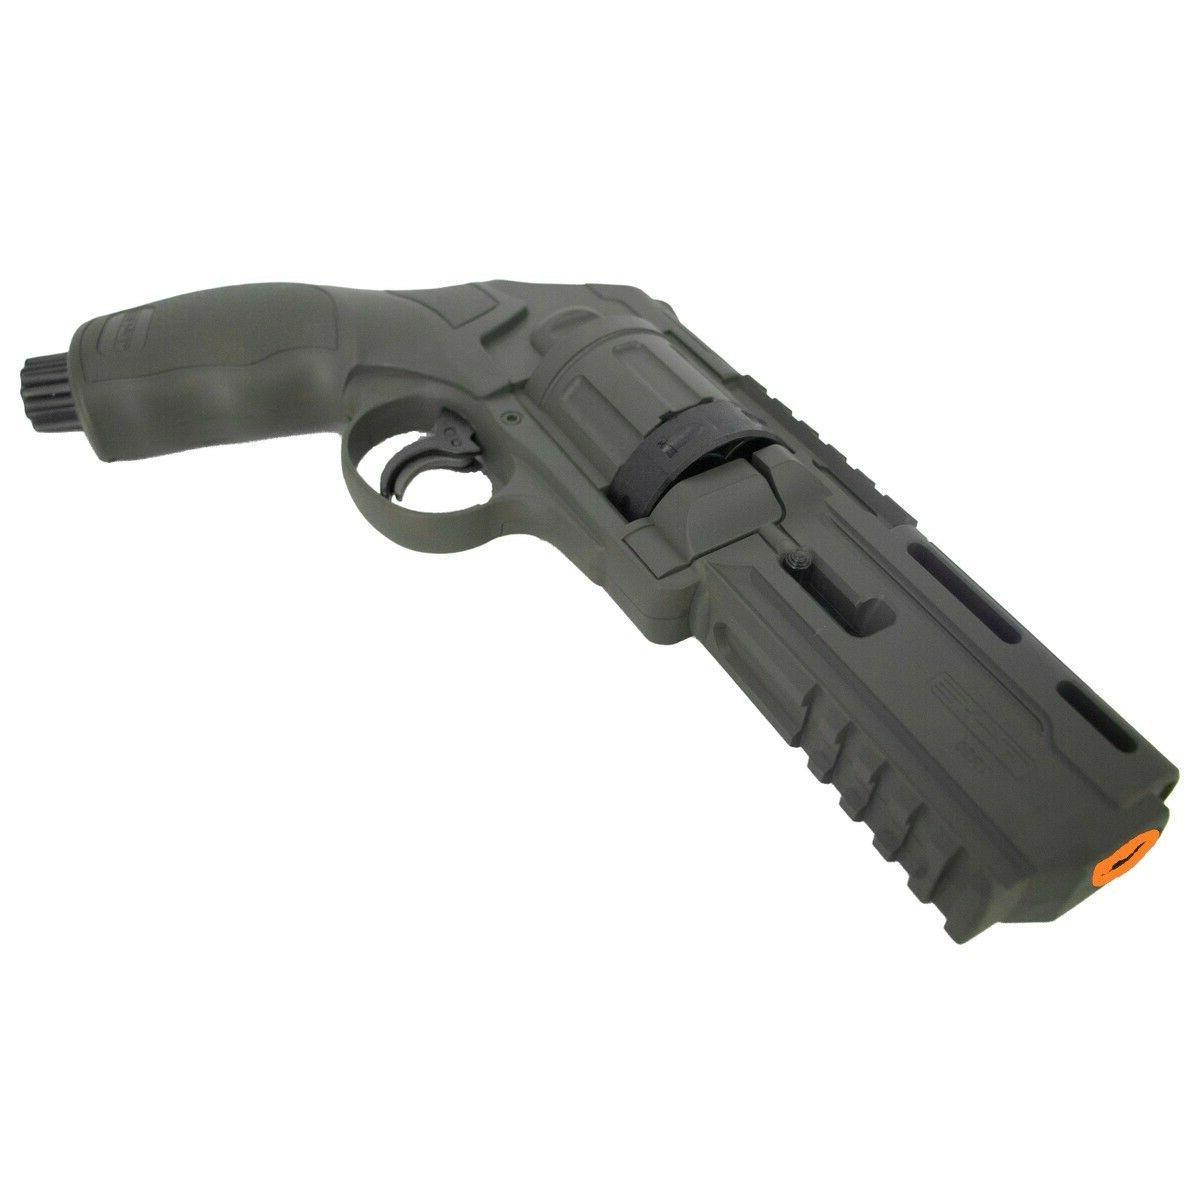 New Cal Paintball Pistol Marker Revolver - Grey